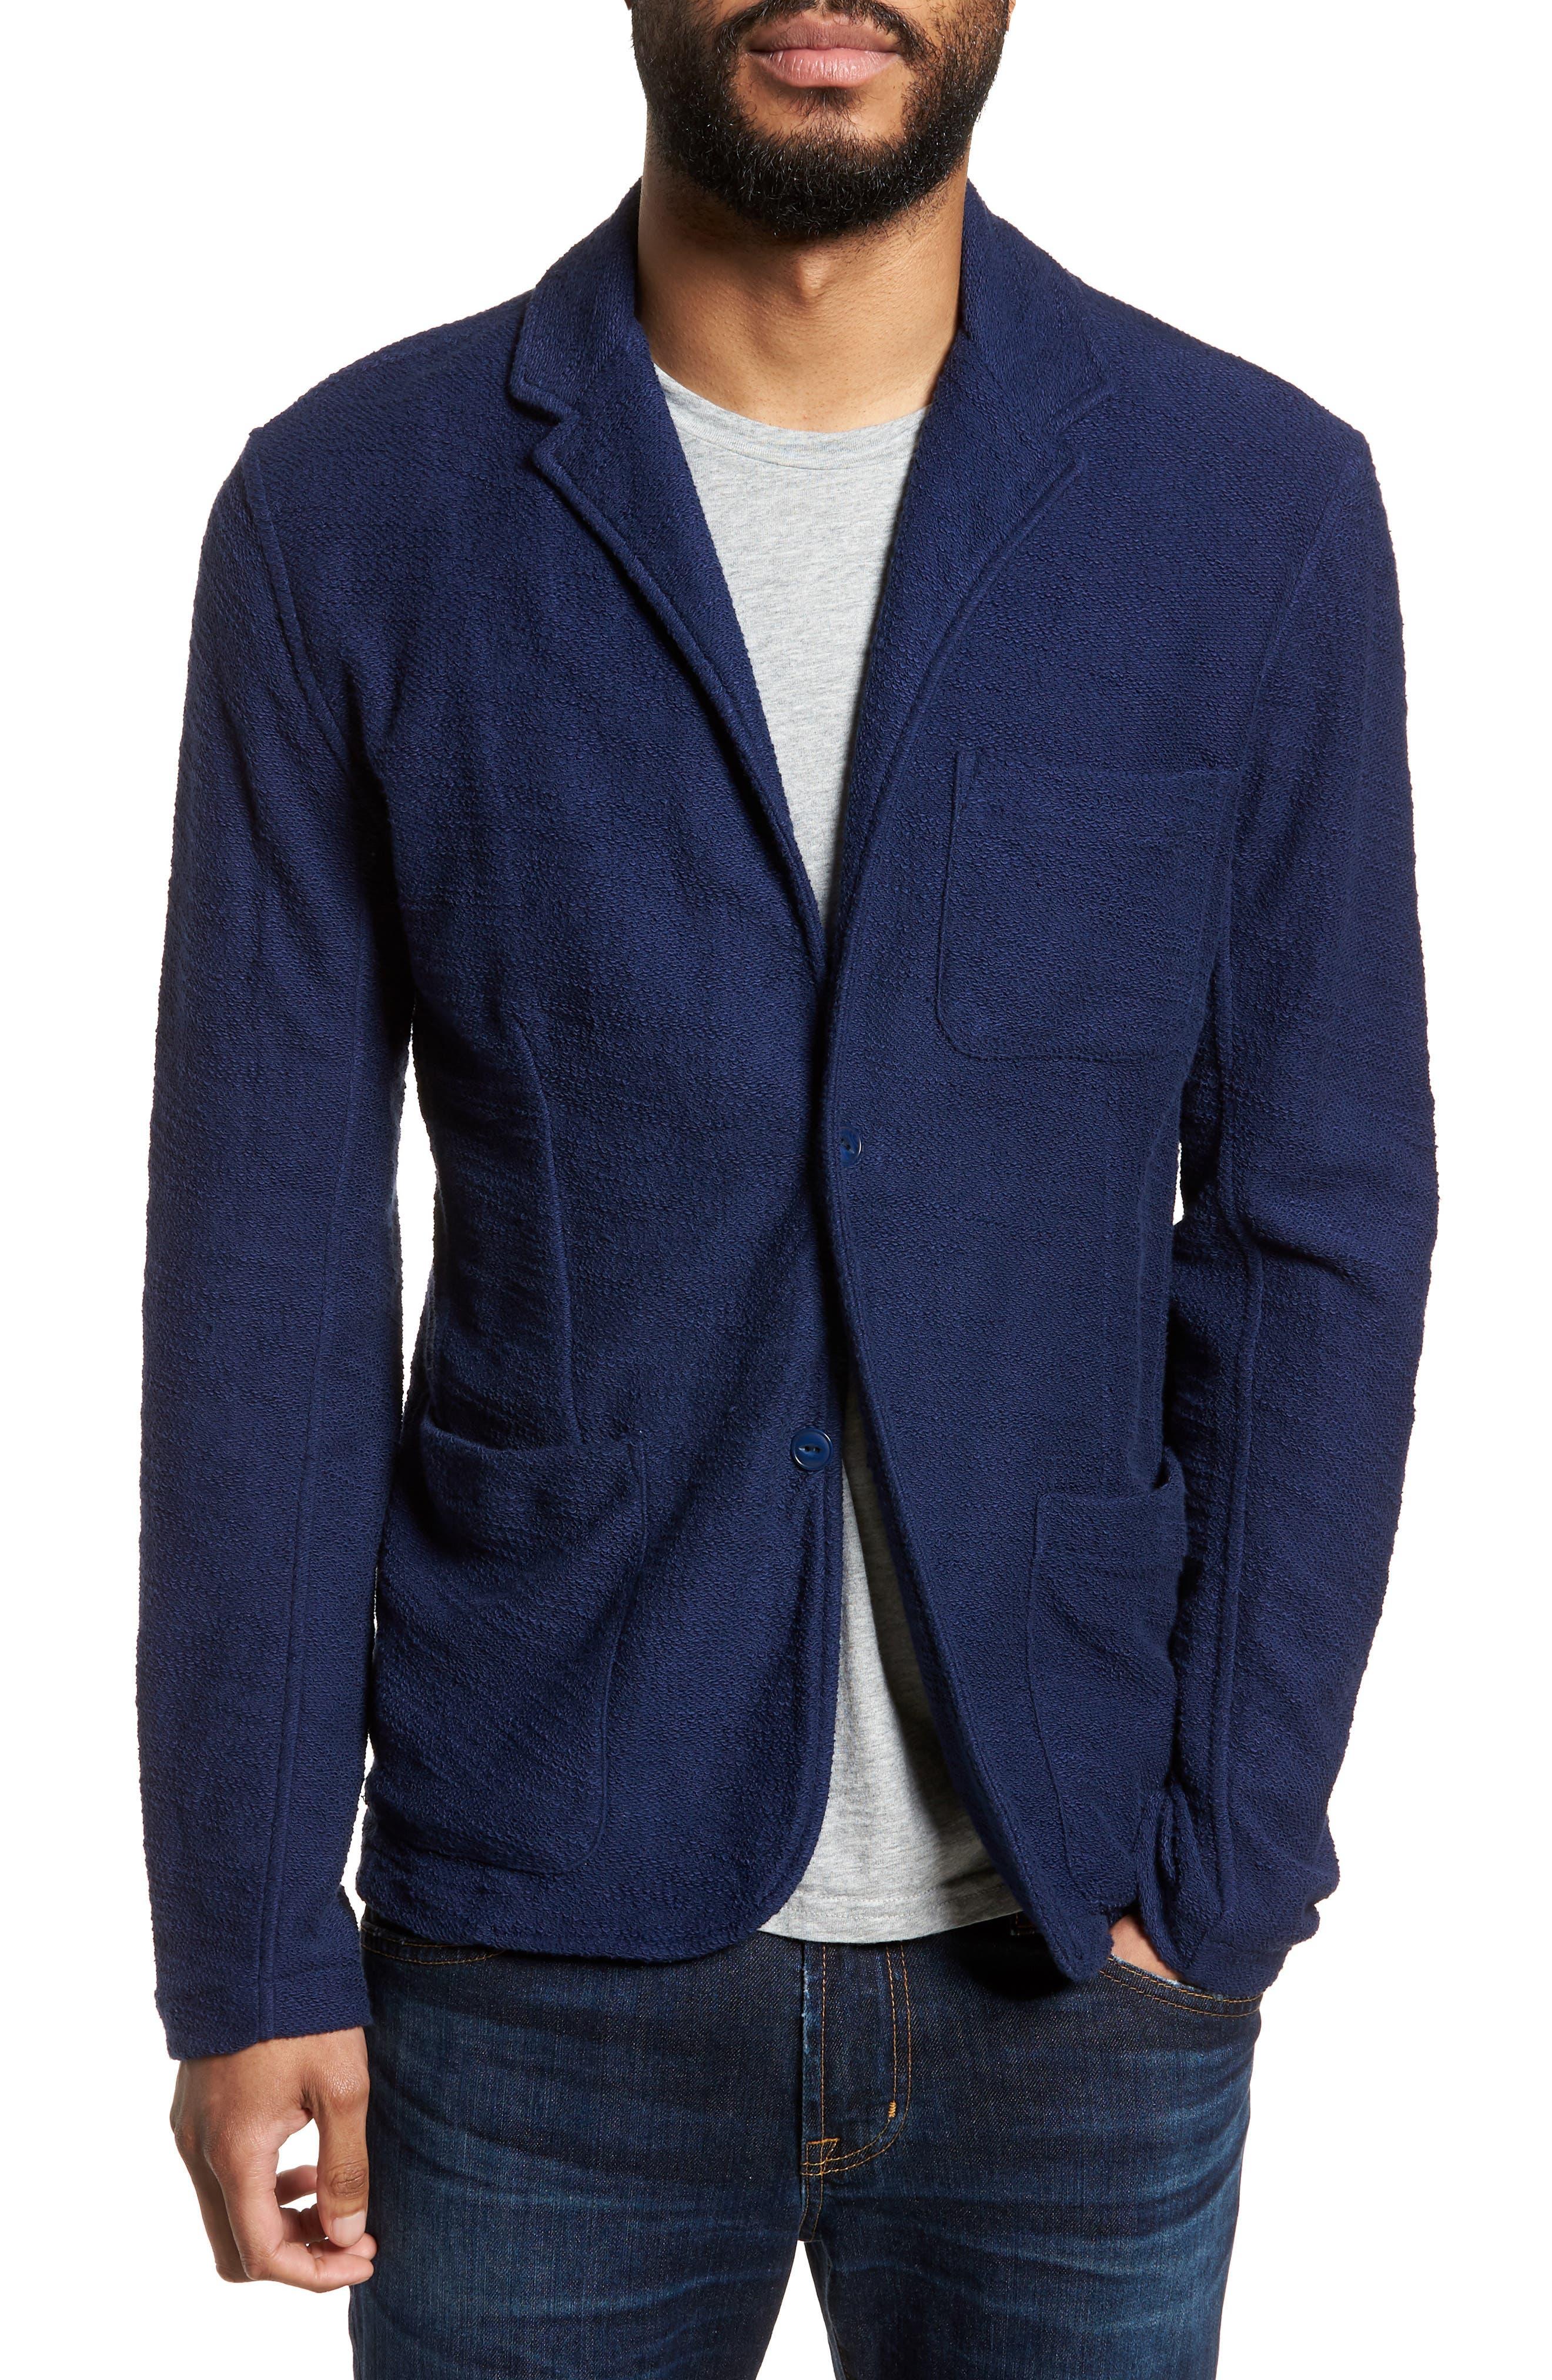 Goodlife Terry Cloth Cotton Blend Blazer